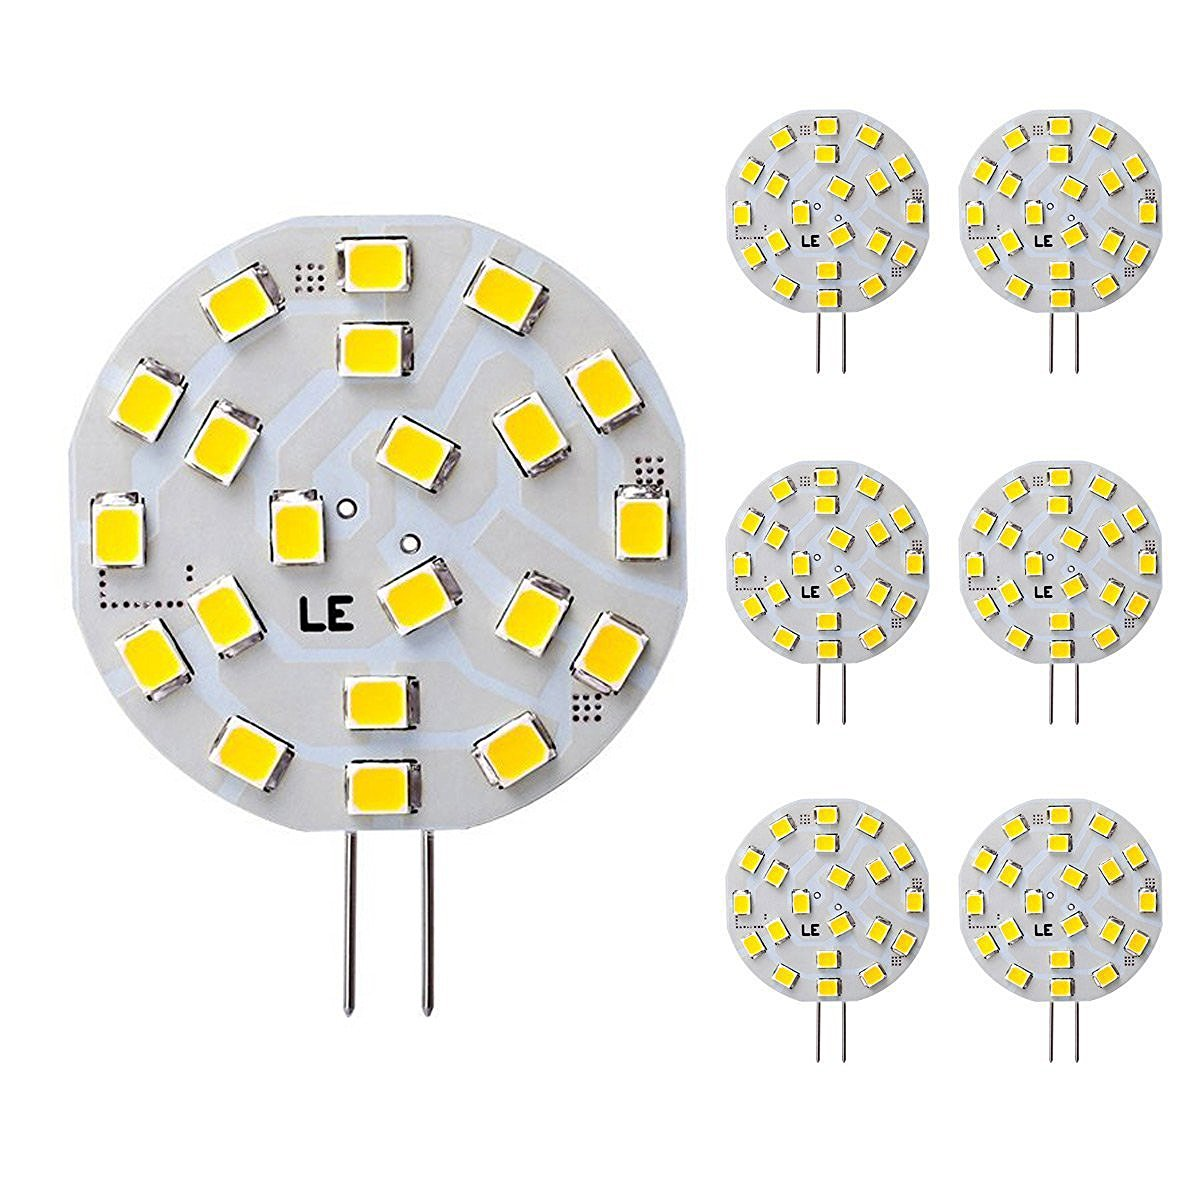 [Bündel] 3W G4 LED Stiftsockellampe mit 21 LEDs, 12V 280lm Bi-Pin Disc Lampe, ersetzt 40W Halogenlampe, Warmweiß, 6er Set